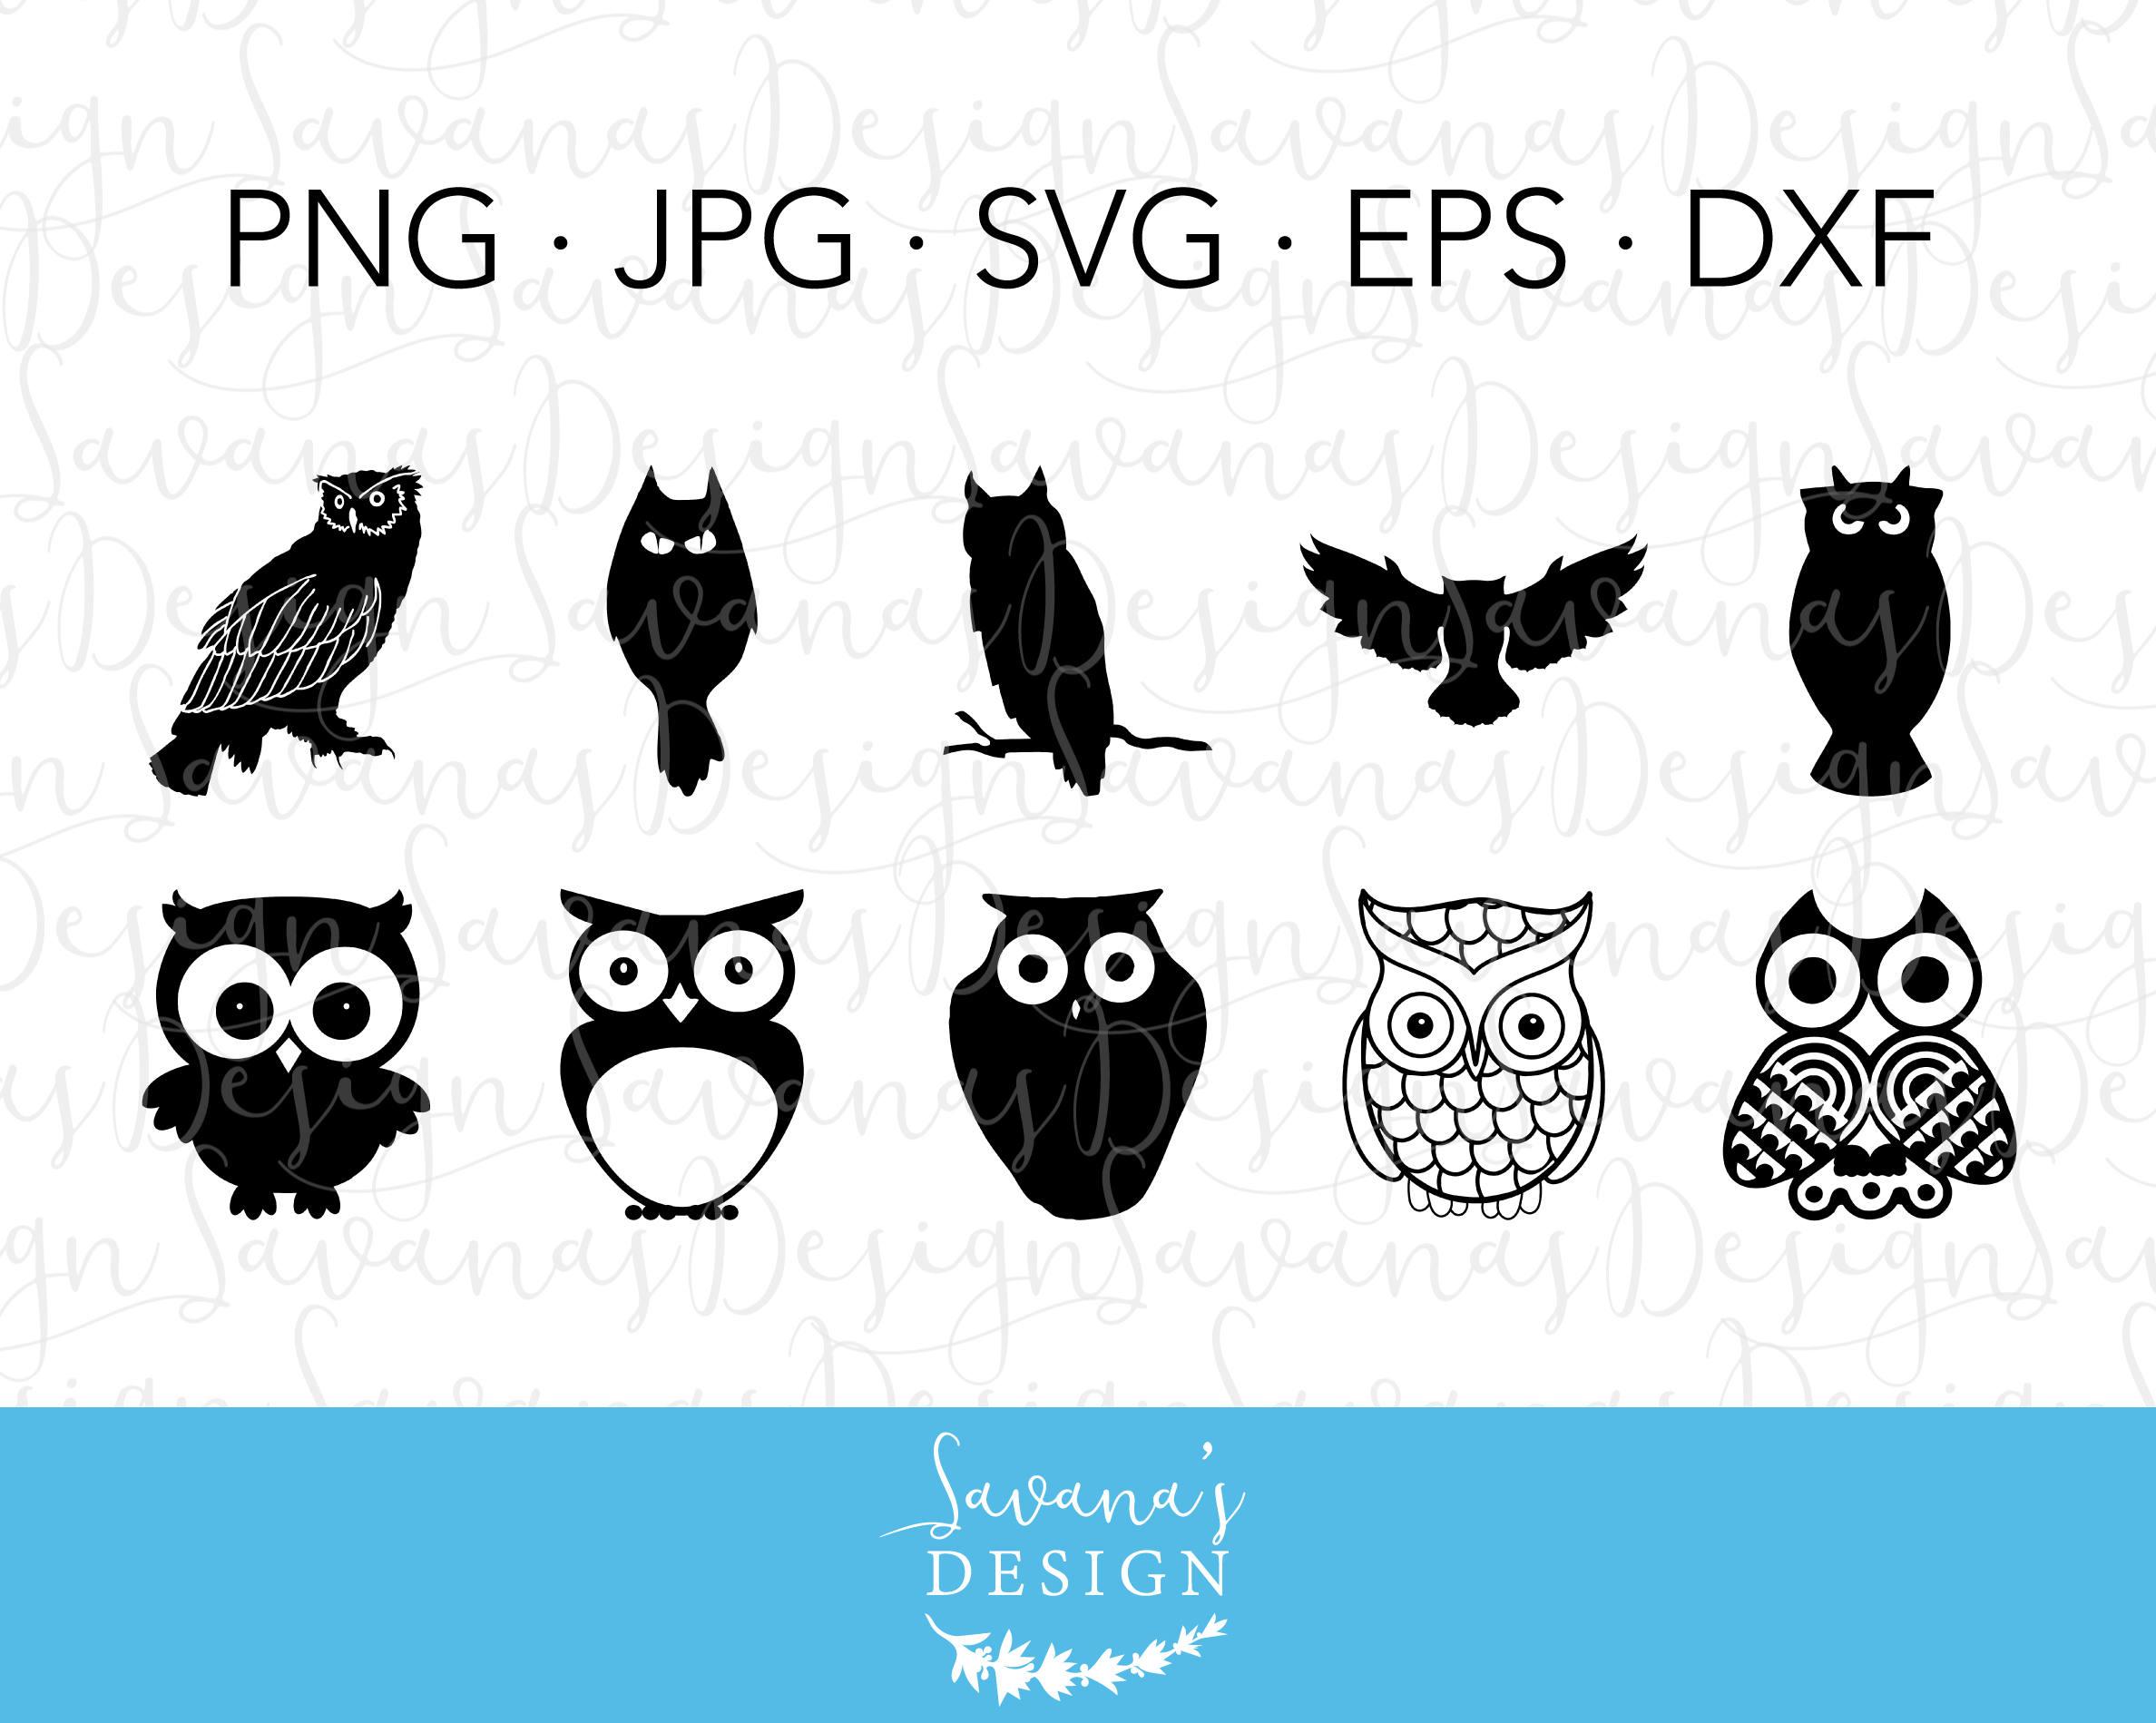 SVG Owl Owl Silhouette SVG Silhouette Owl Halloween Owl | Etsy